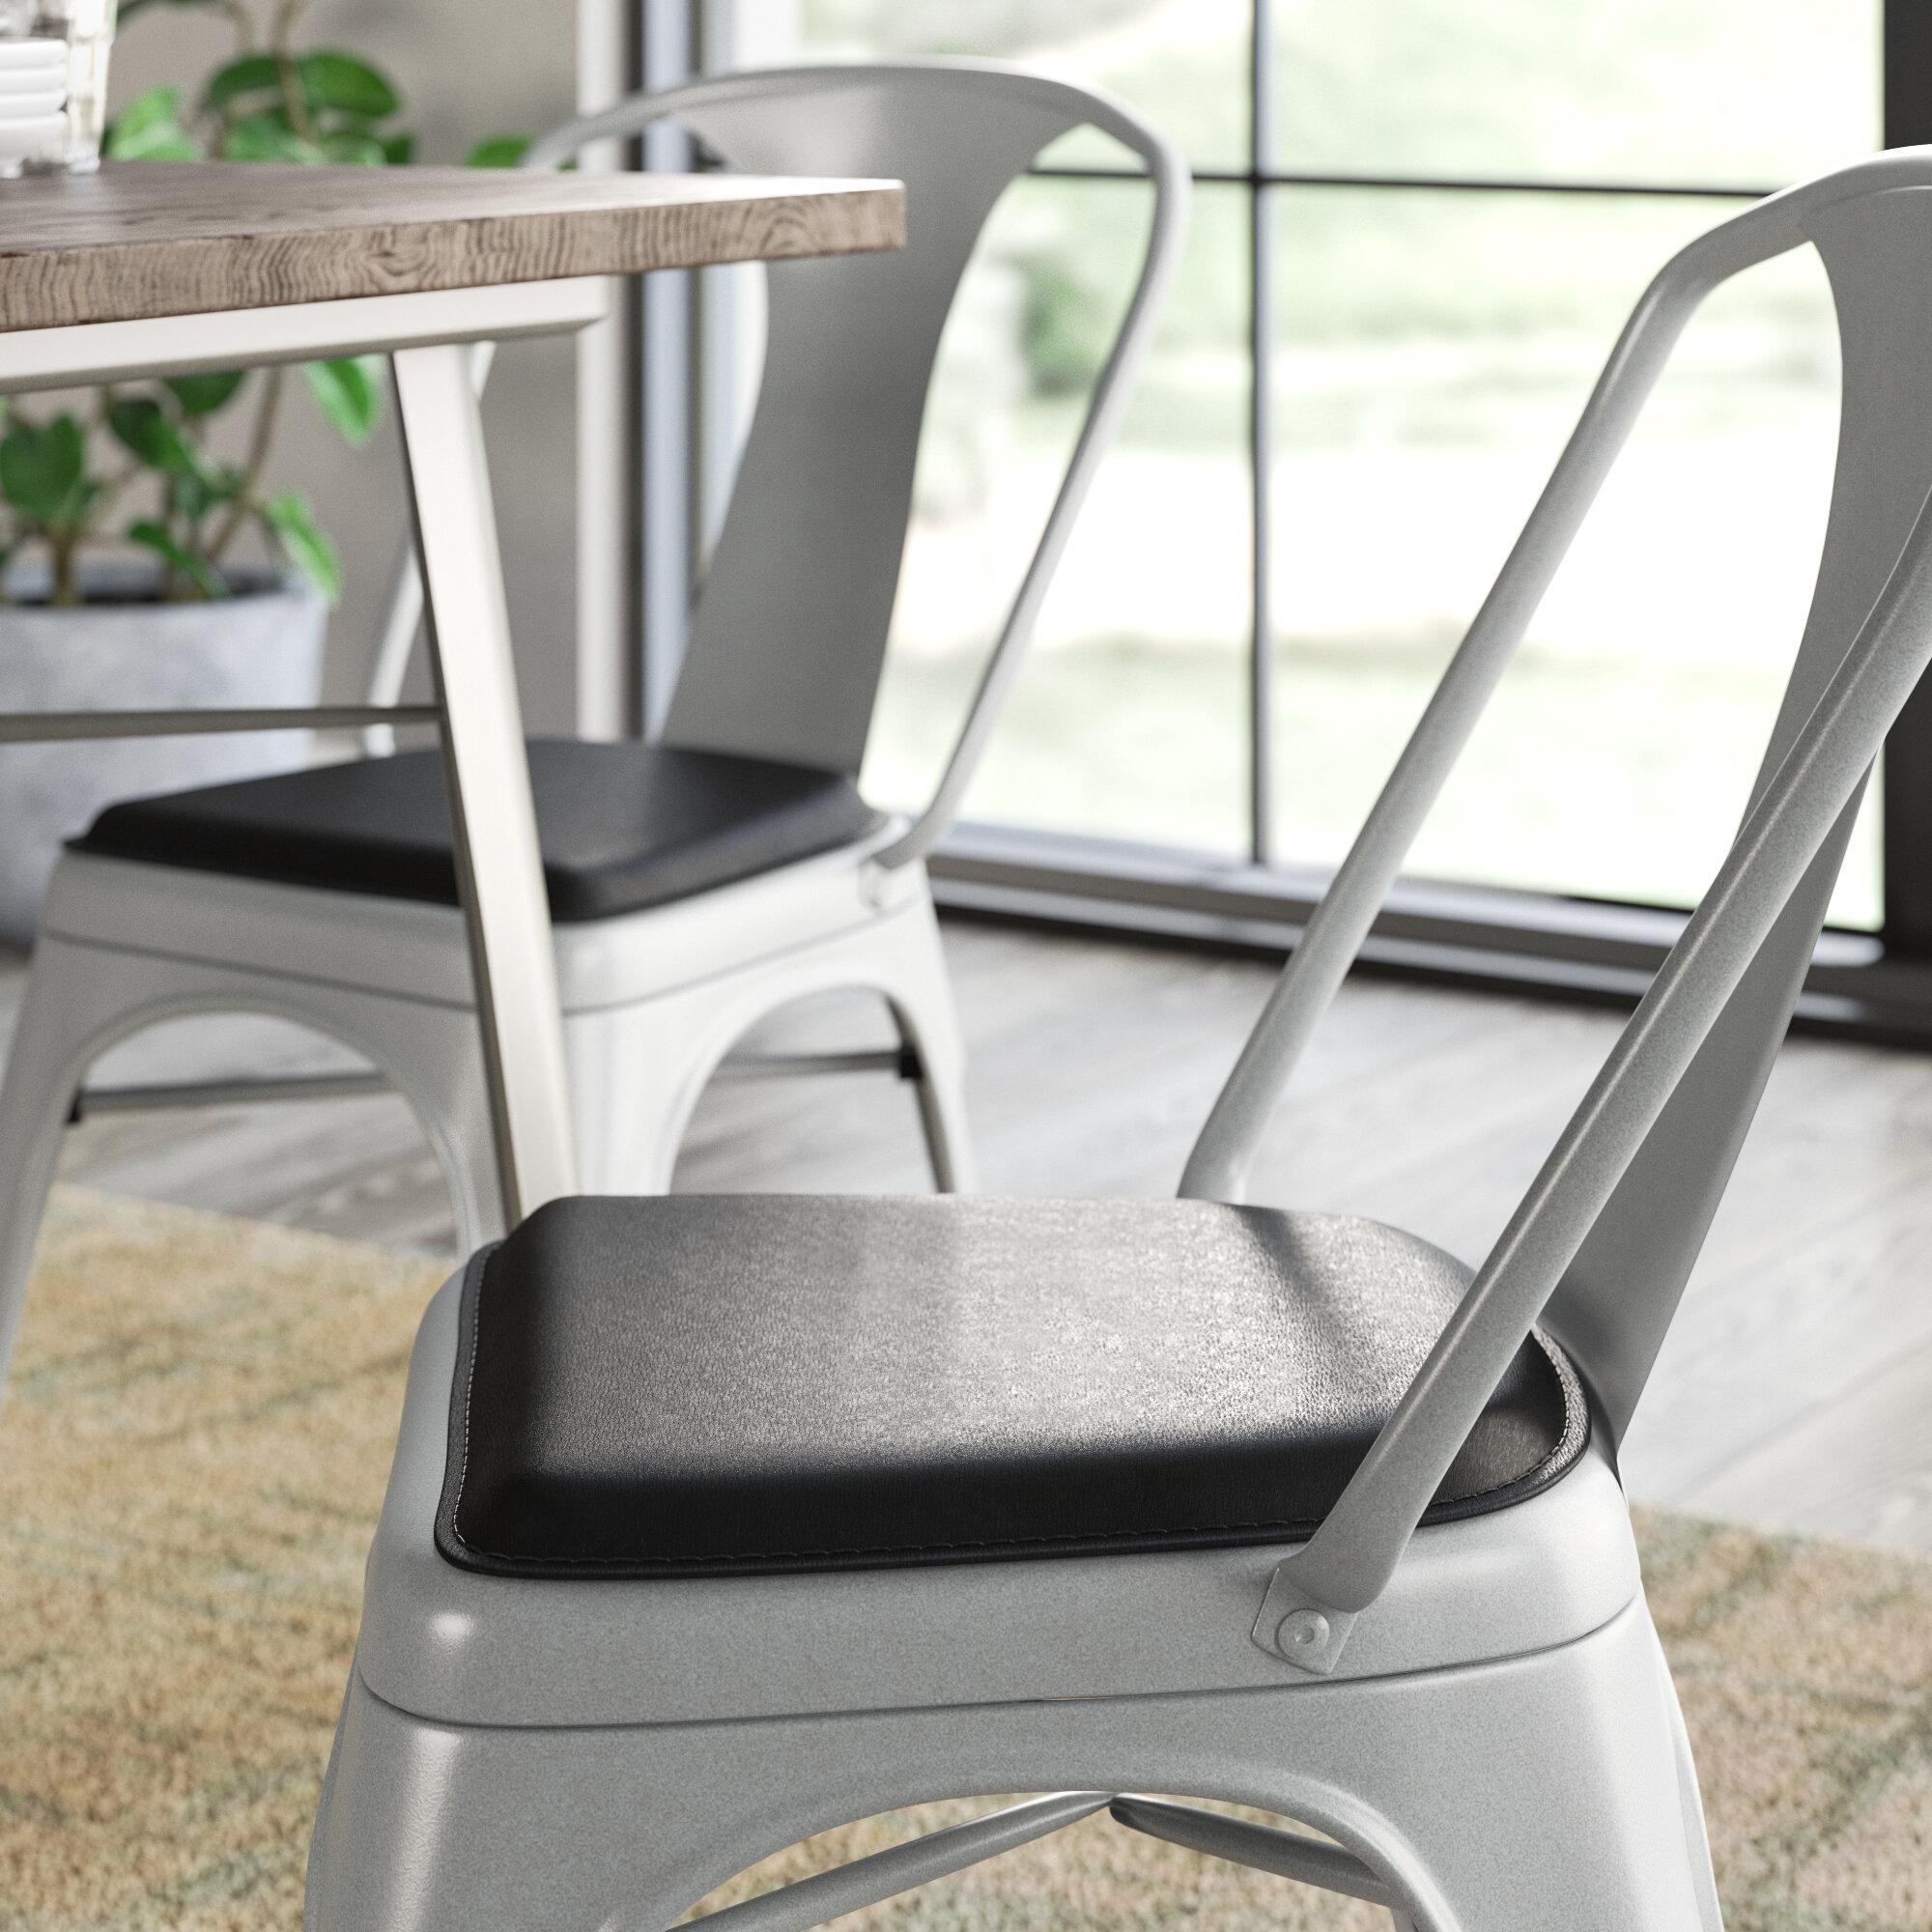 Williston Forge Dining Chair Cushion